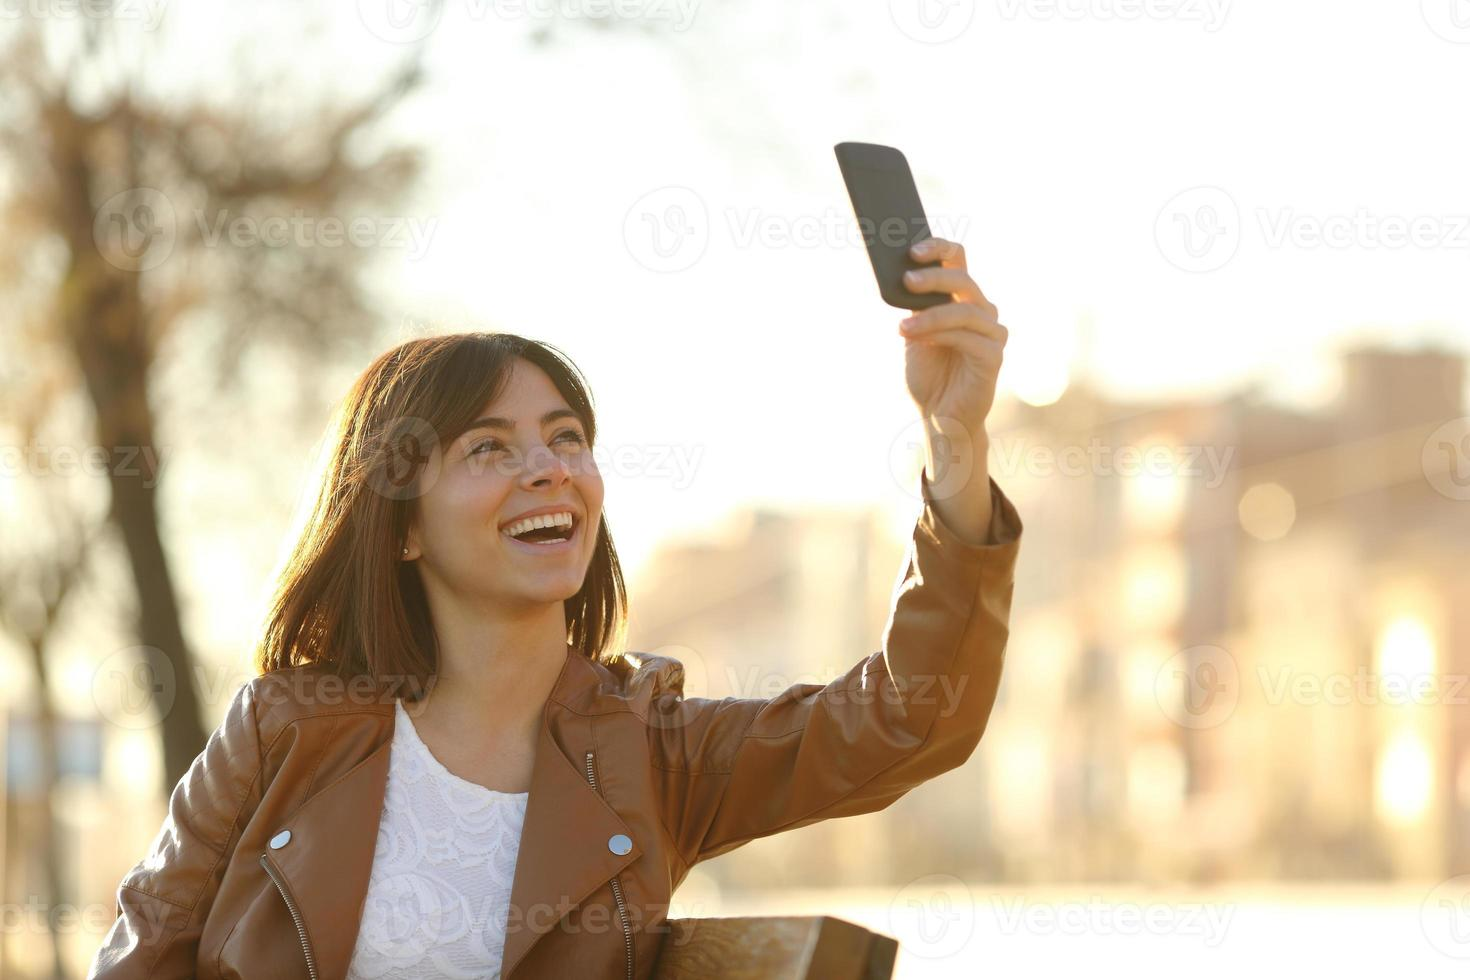 femme, prendre, selfie, photo, smarphone, hiver photo